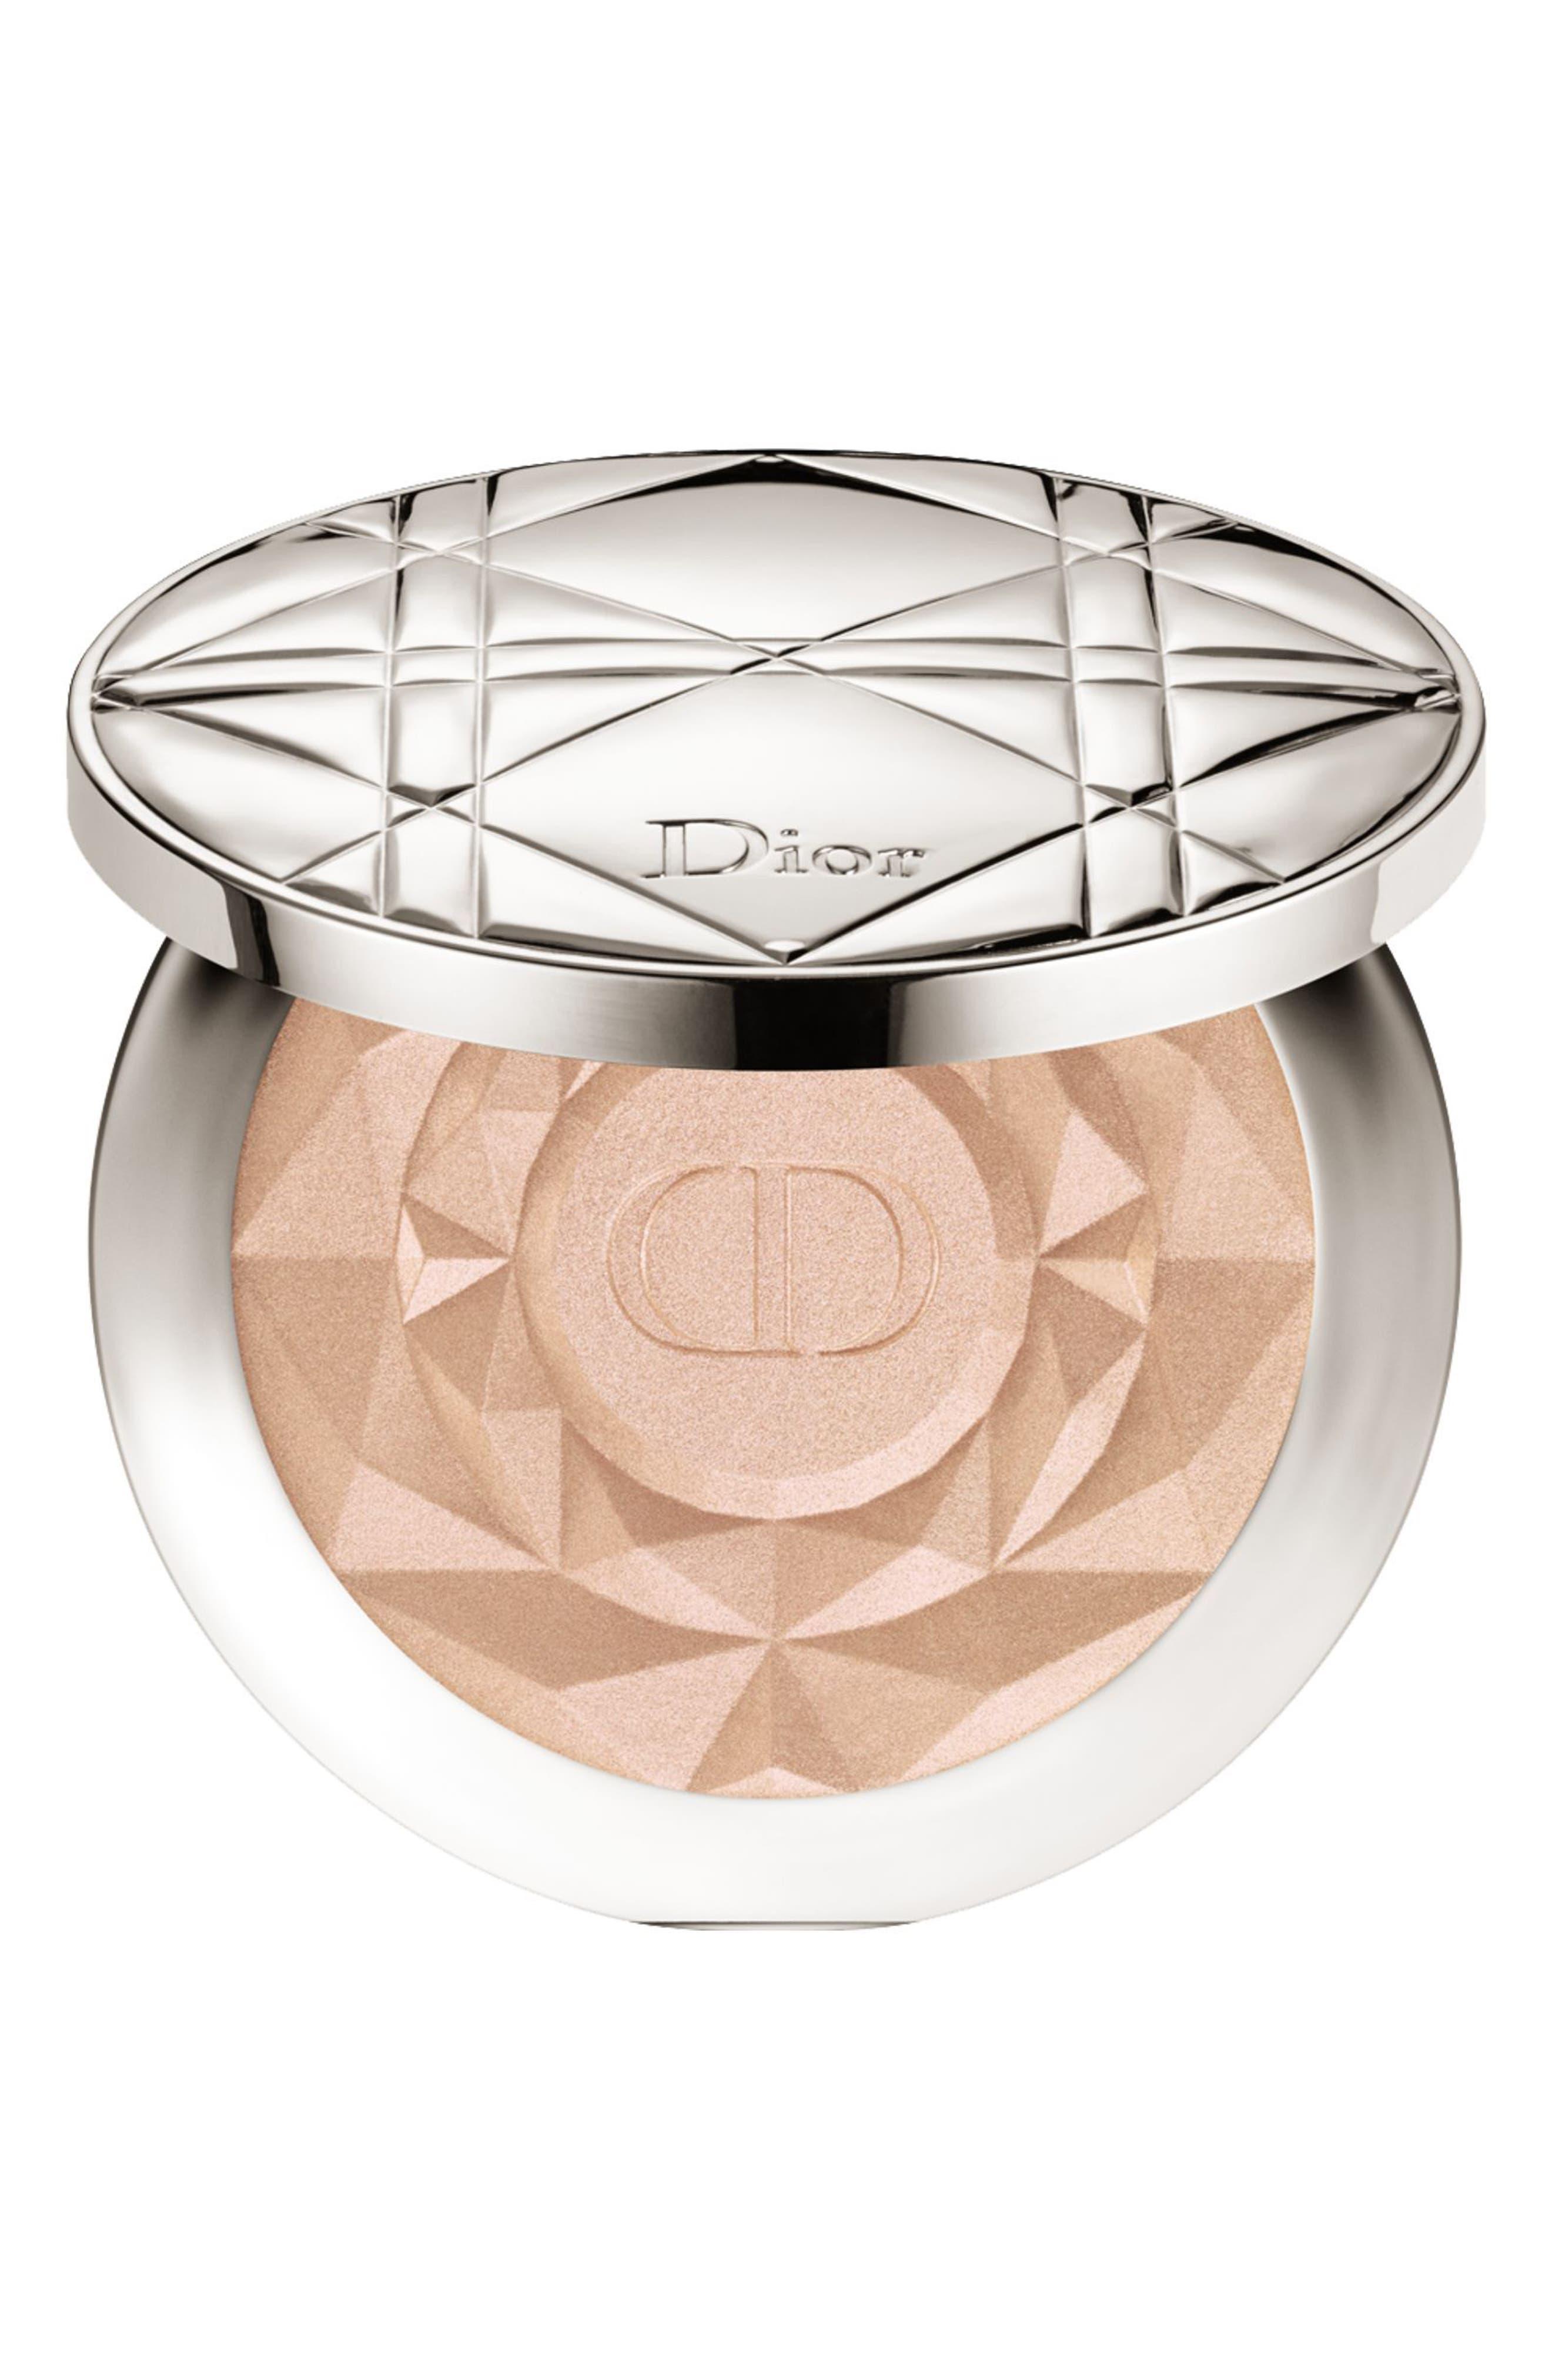 Dior Diorskin Nude Air Luminizer Precious Rocks Shimmering Sculpting Powder (Limited Edition)